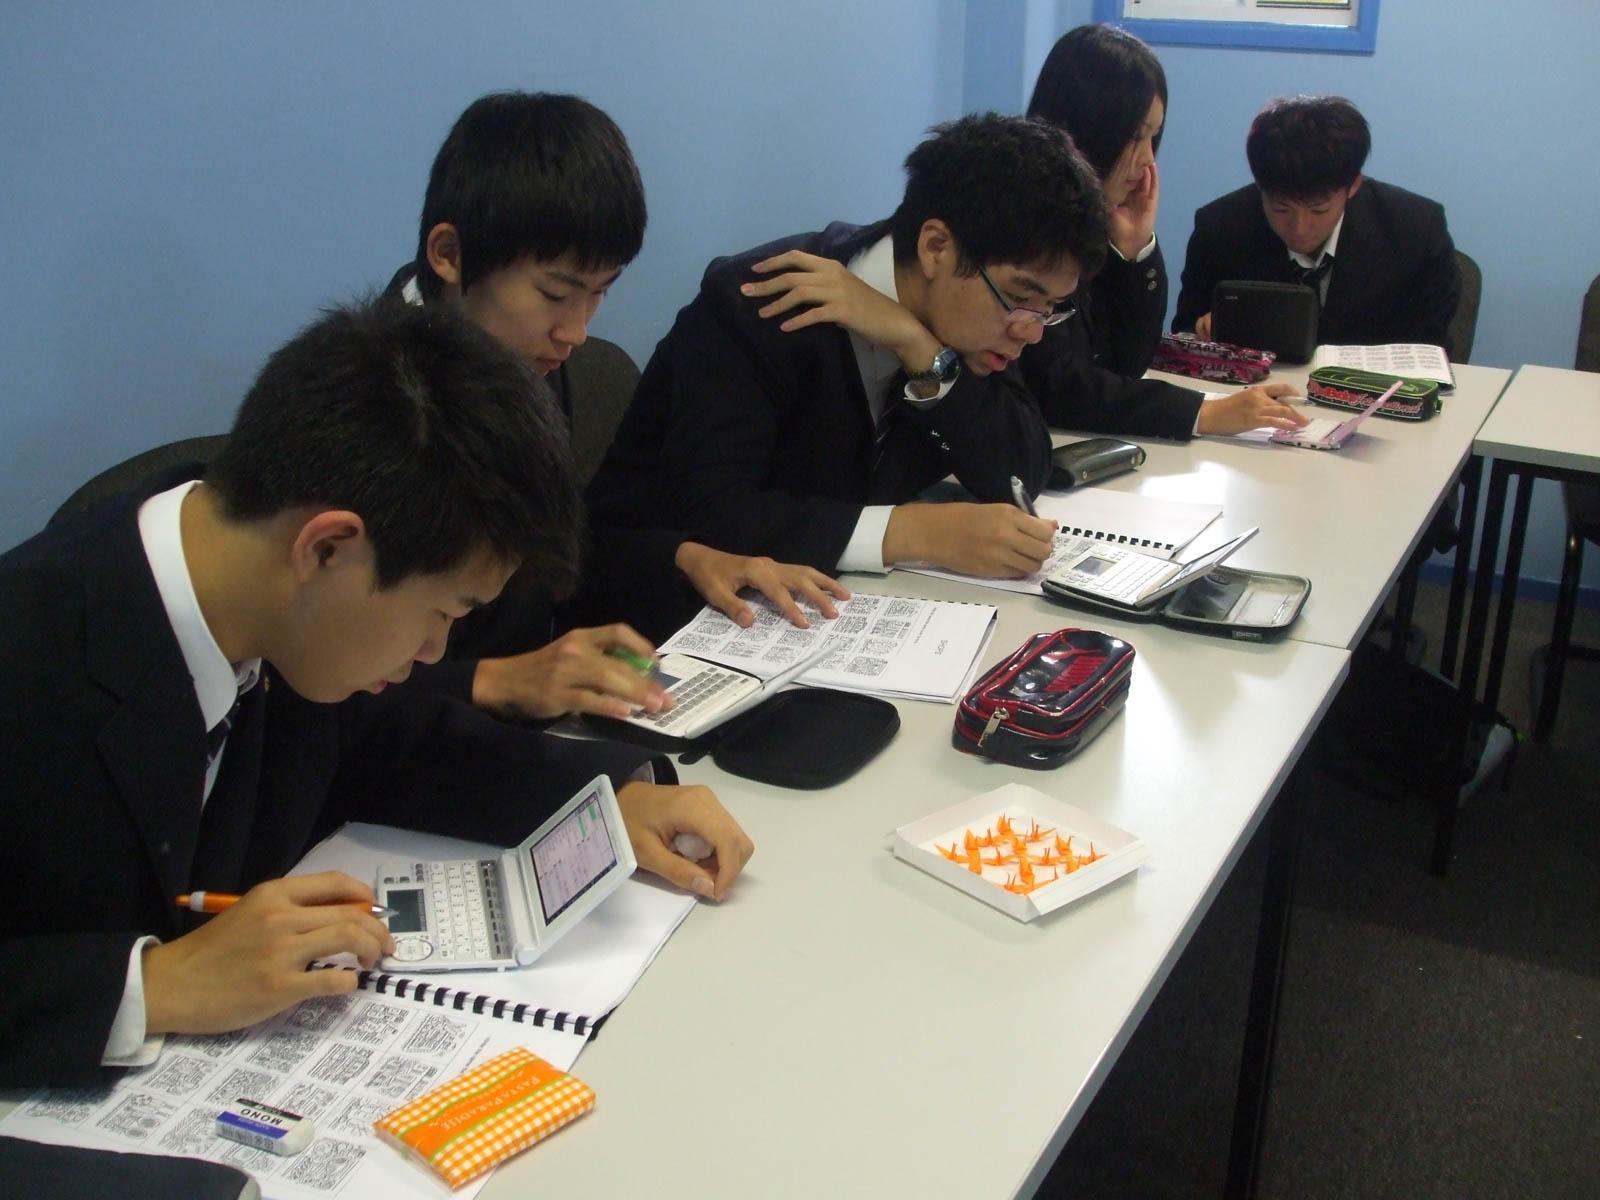 Teen_group_program_BBELS-Higashino 157